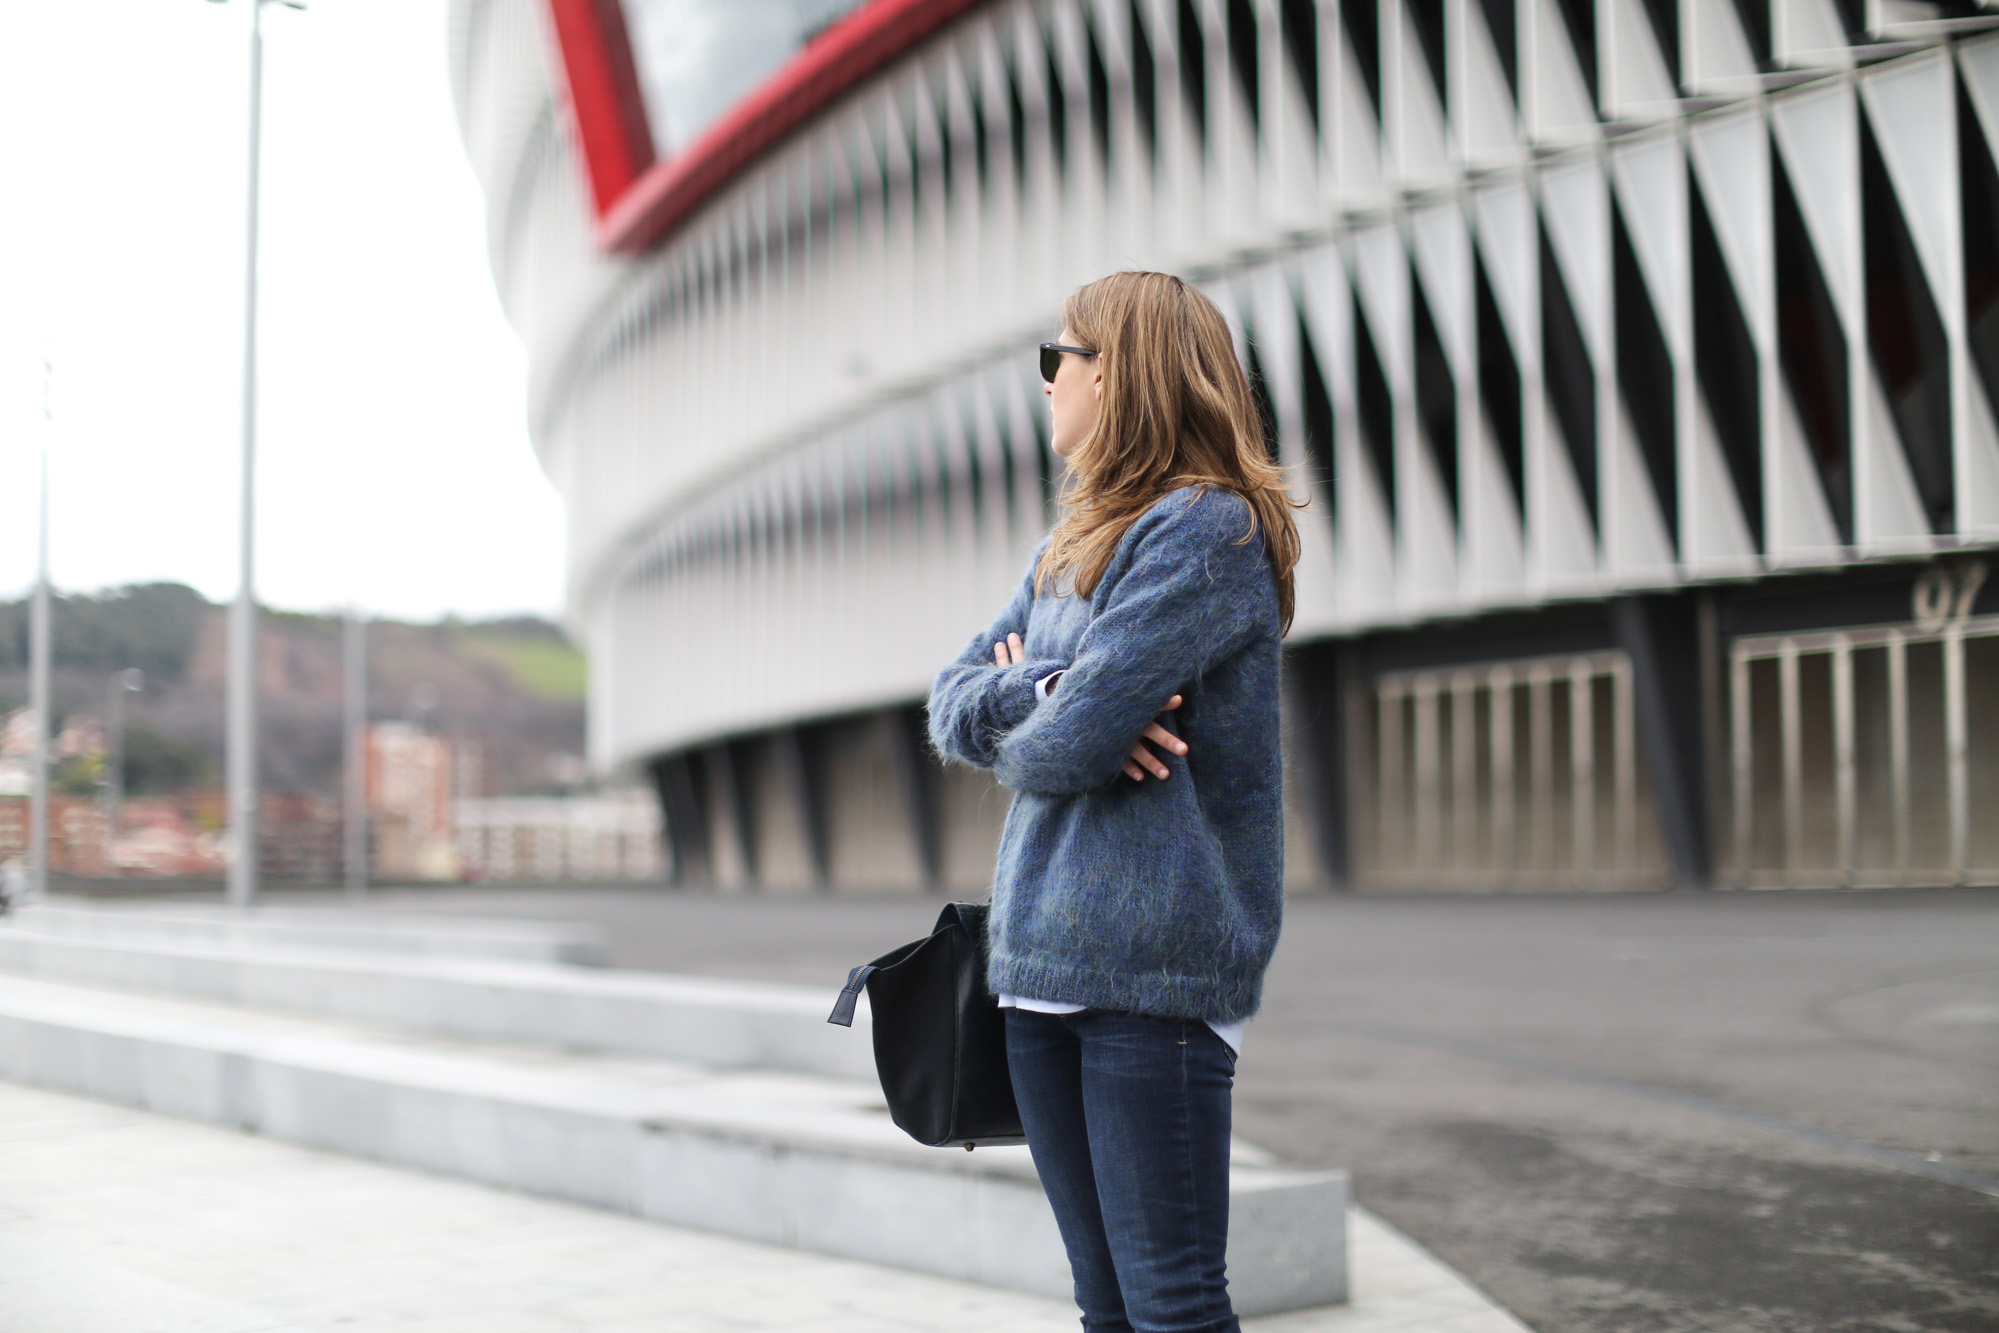 Clochet-streetstyle-bimbaylola-blue-knit-topshop-baxter-jeans-sushibag-7